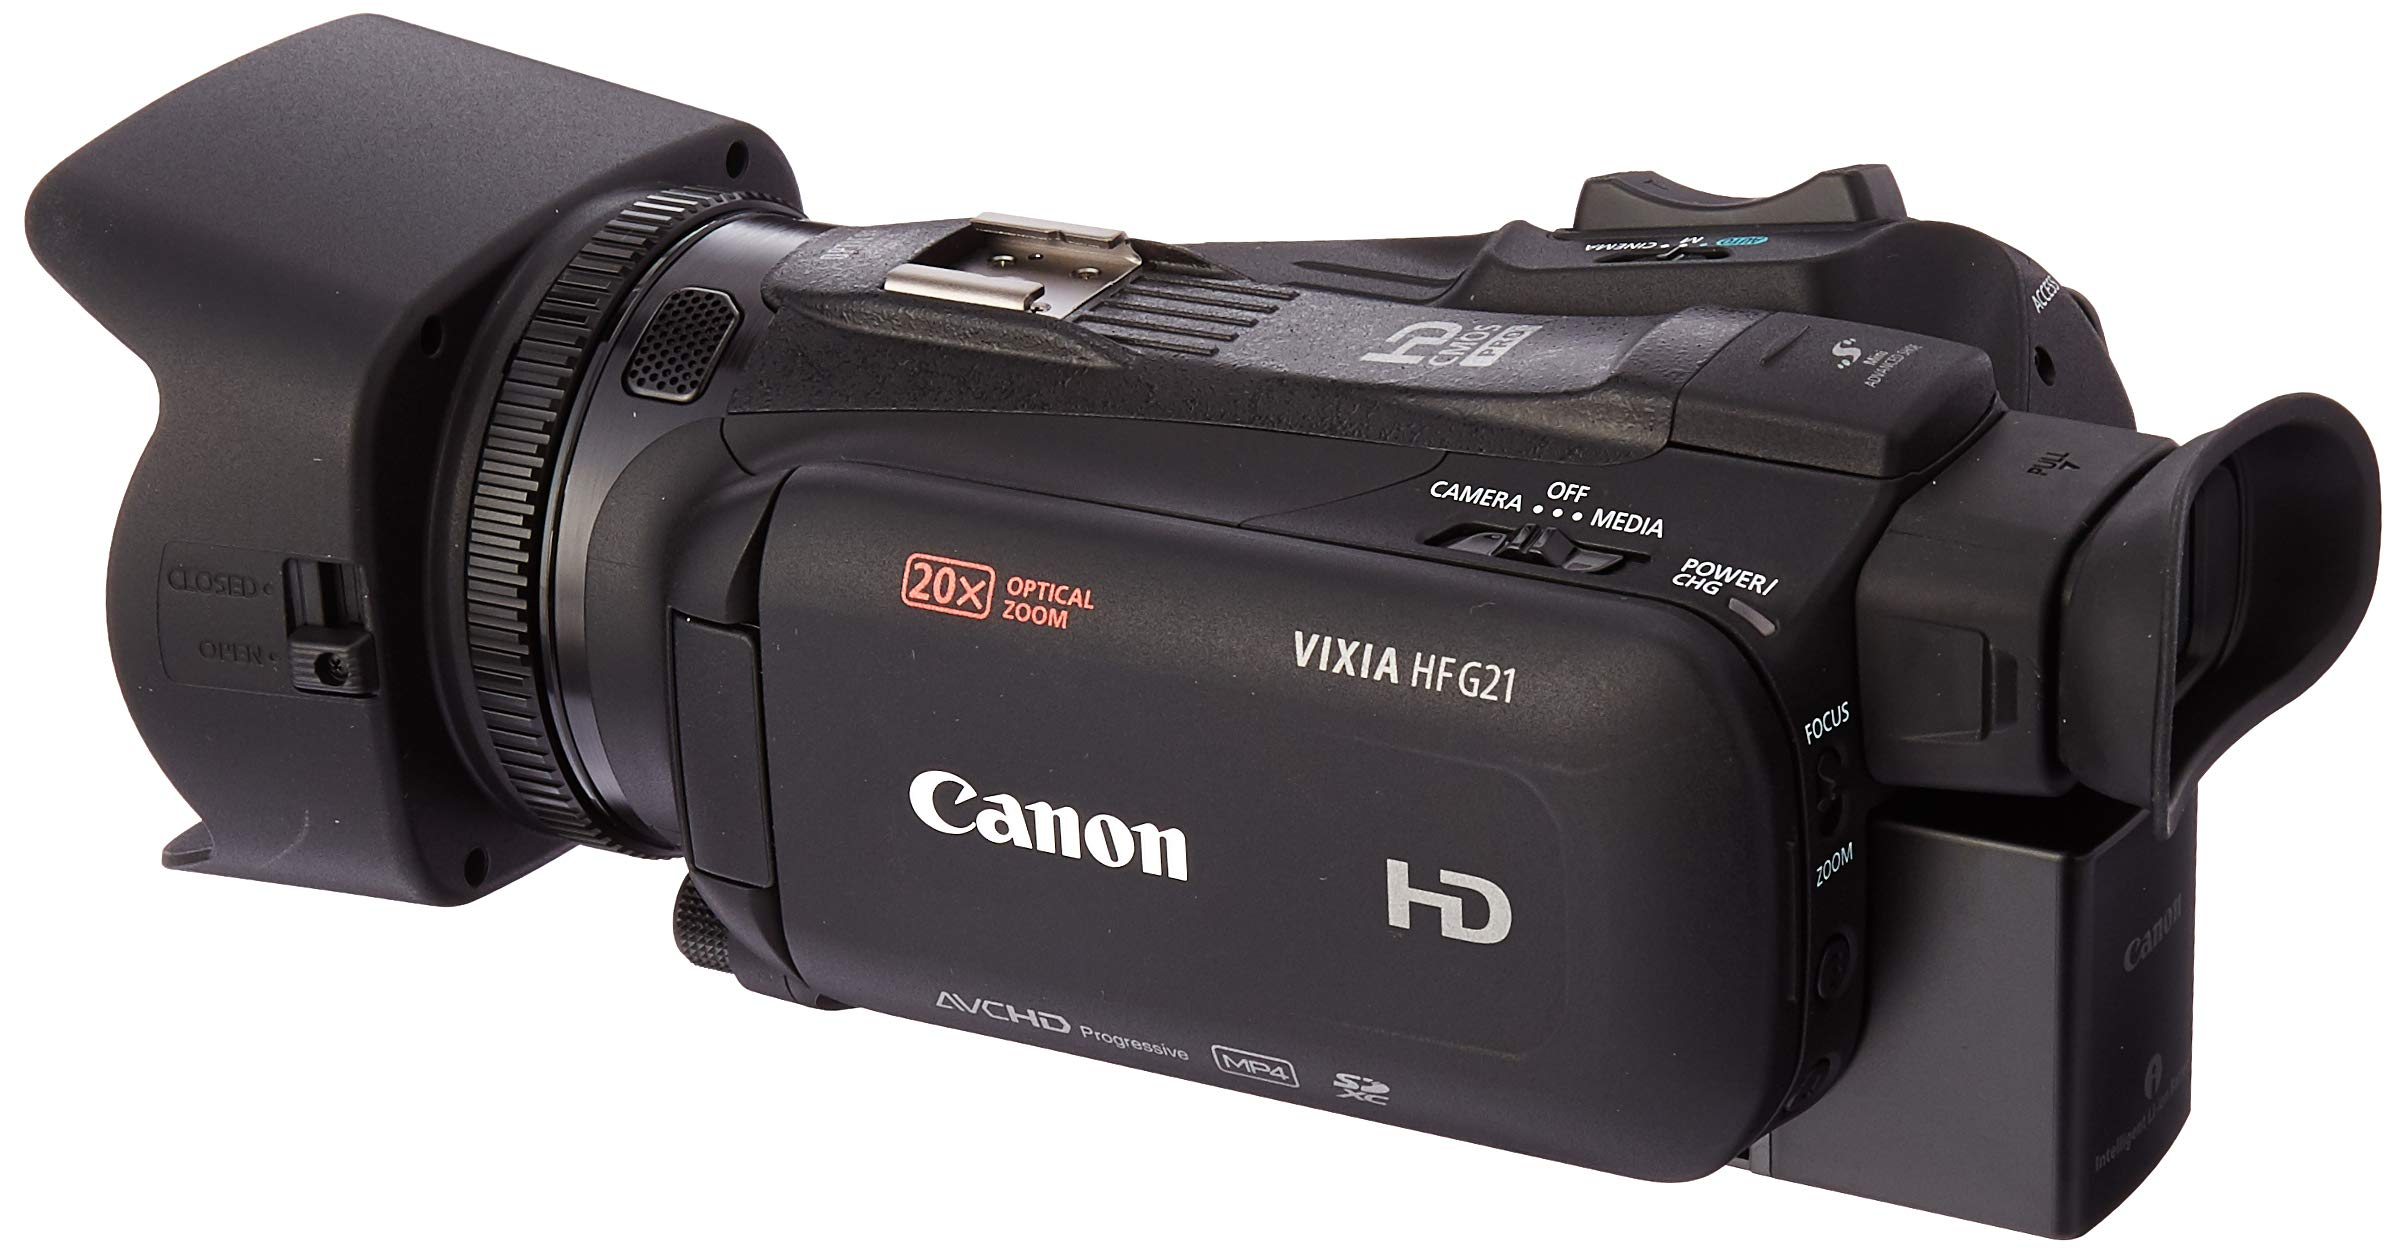 Canon VIXIA HF G21 Full HD Camcorder -Mega Accessory